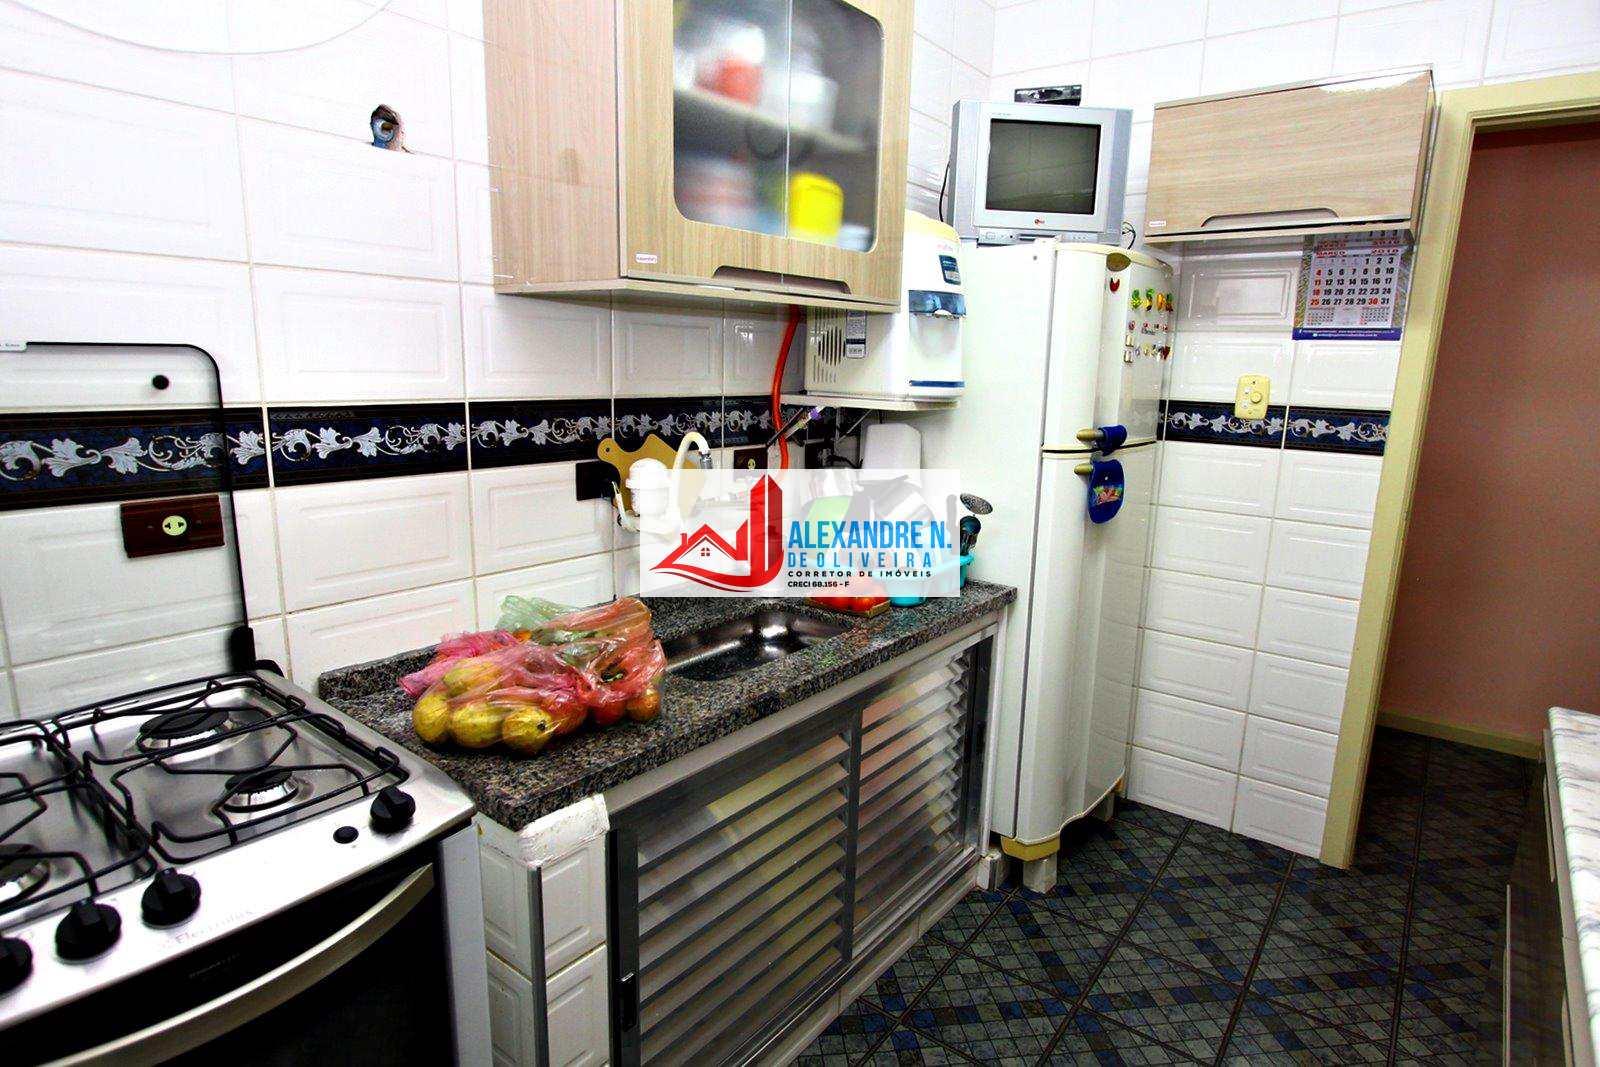 Frente-mar, 2 dorm, Tupi, Praia Grande, R$ 300 mil, AP00438